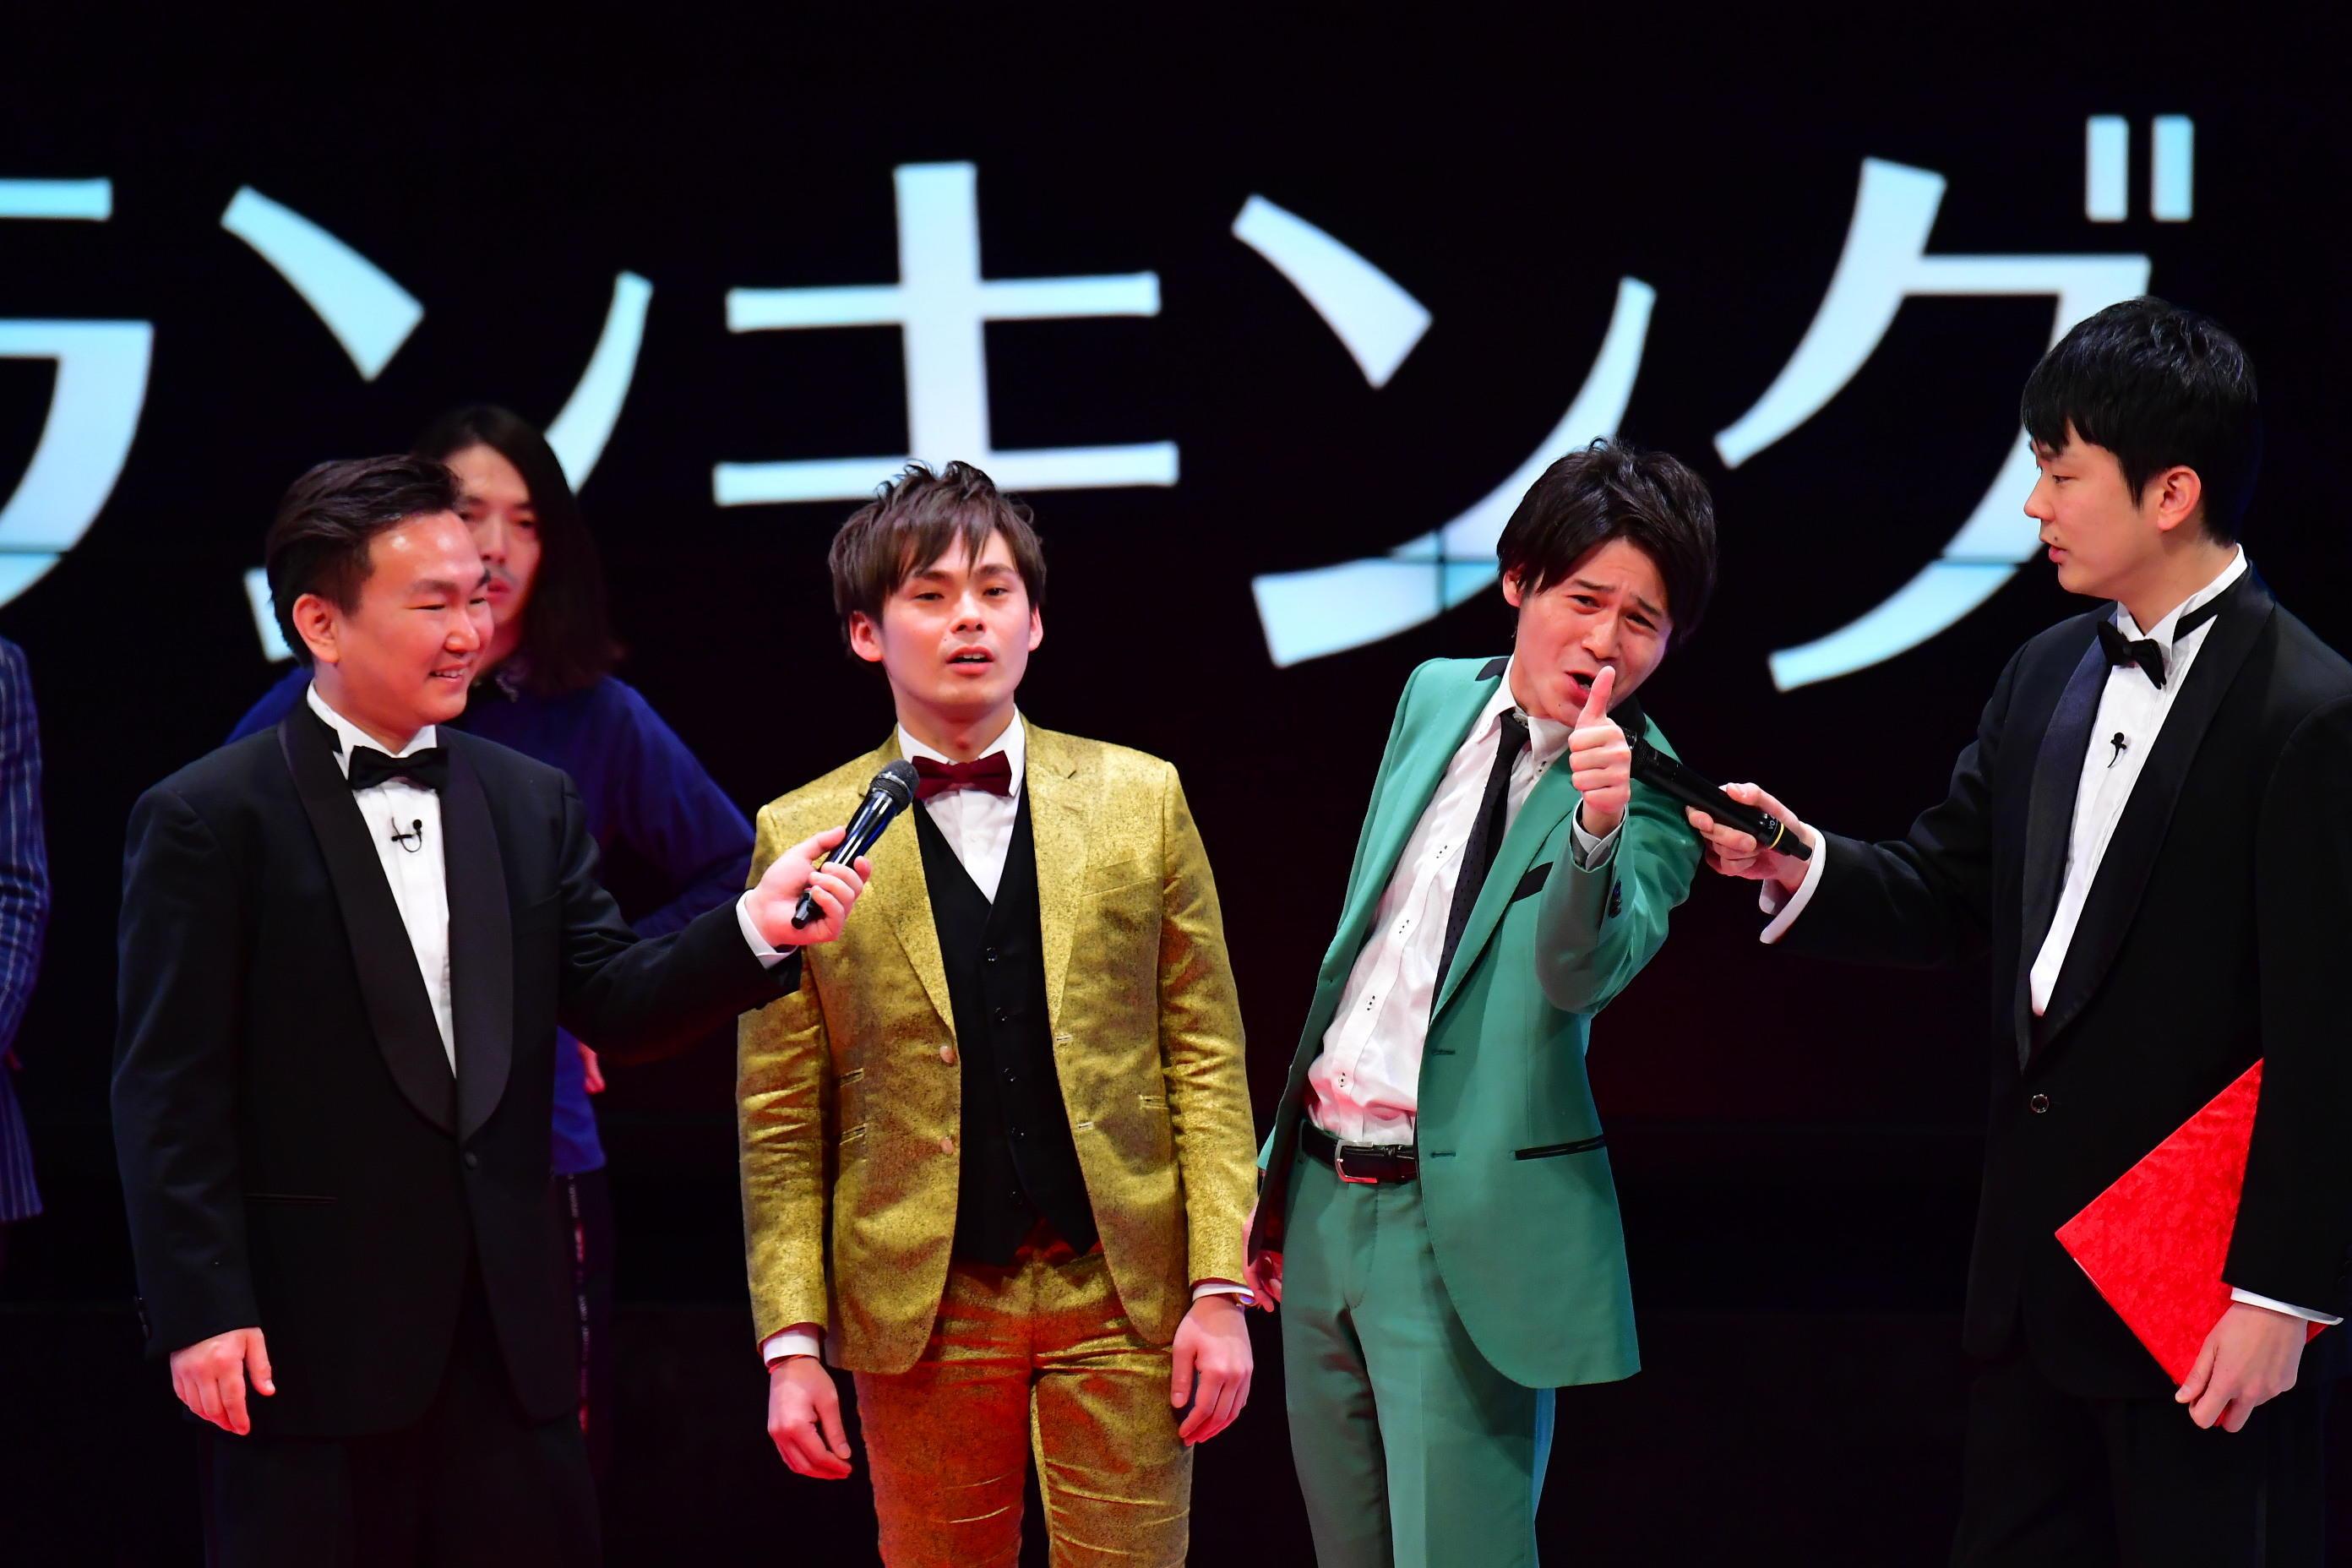 http://news.yoshimoto.co.jp/20180109015818-500a44fc6369e8baa269d0105b350eaecd7bf8cd.jpg